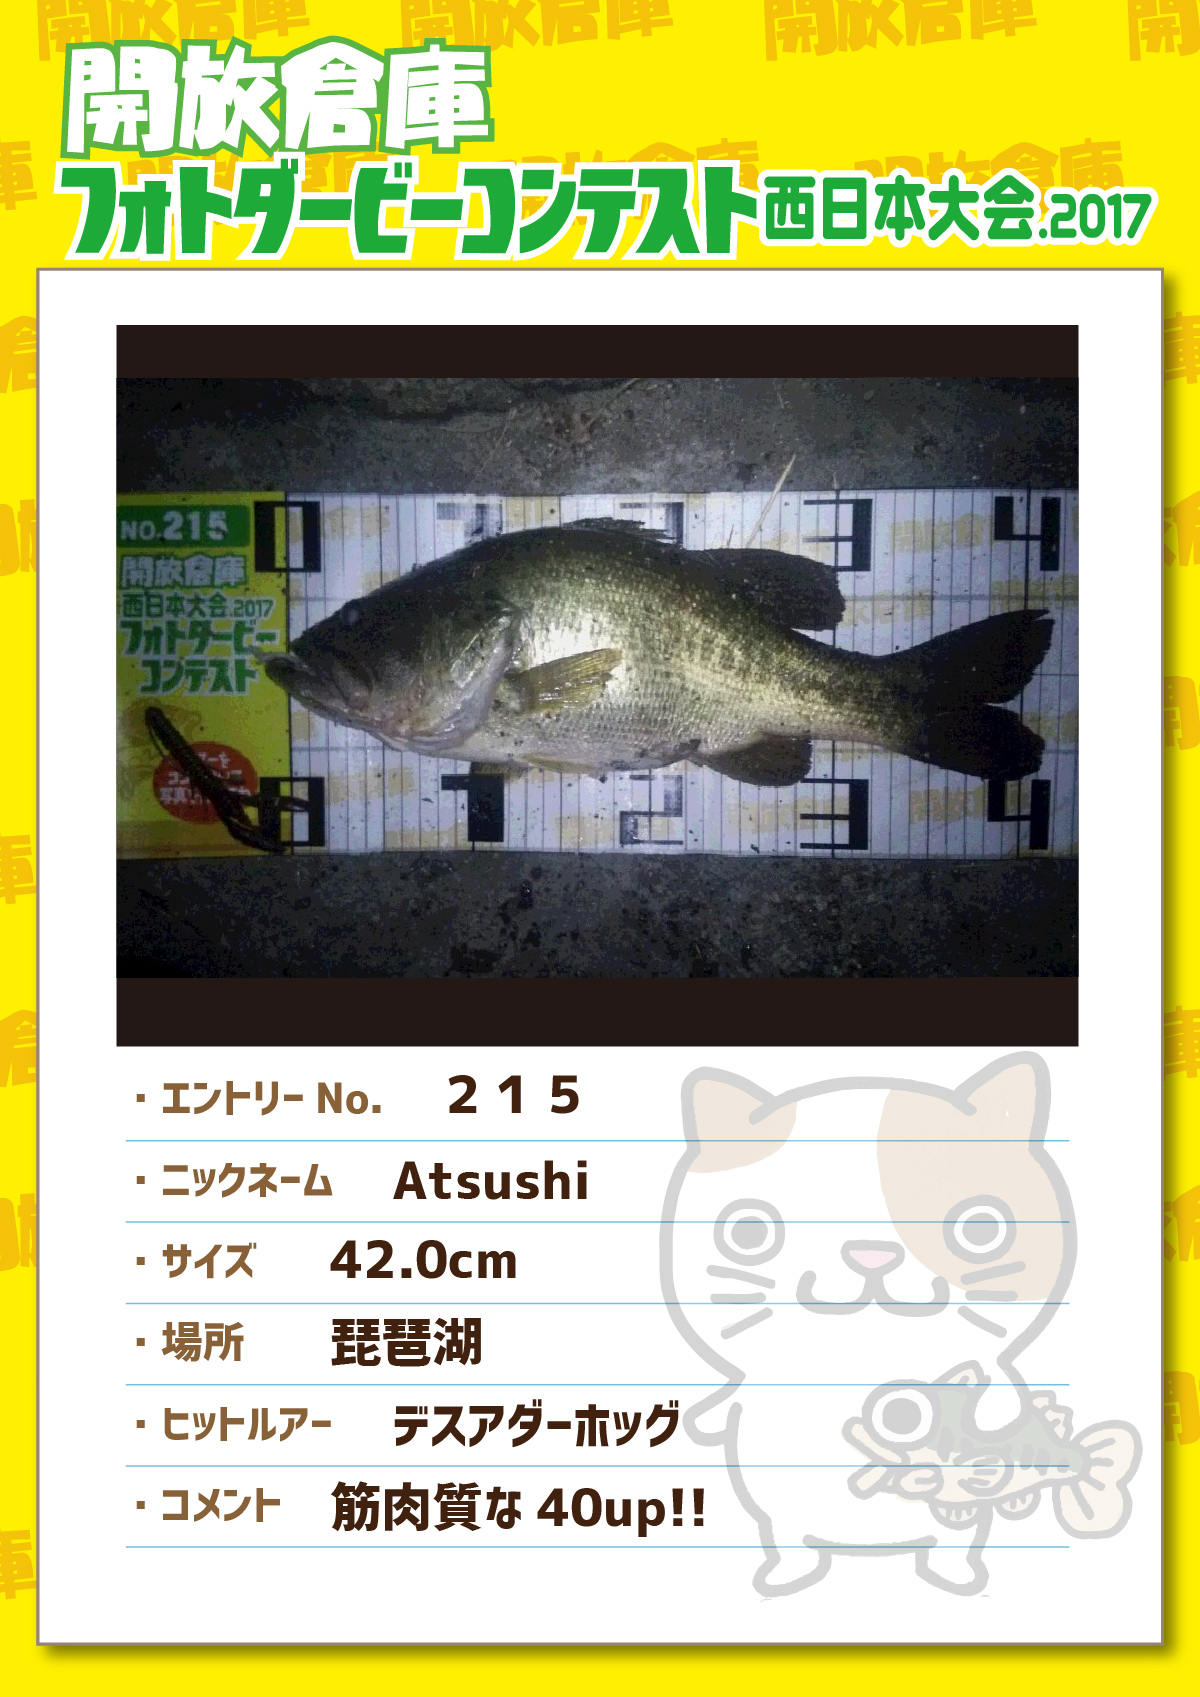 No.215 Atsushi 42.0cm 琵琶湖 デスアダーホッグ 筋肉質な40UP!!